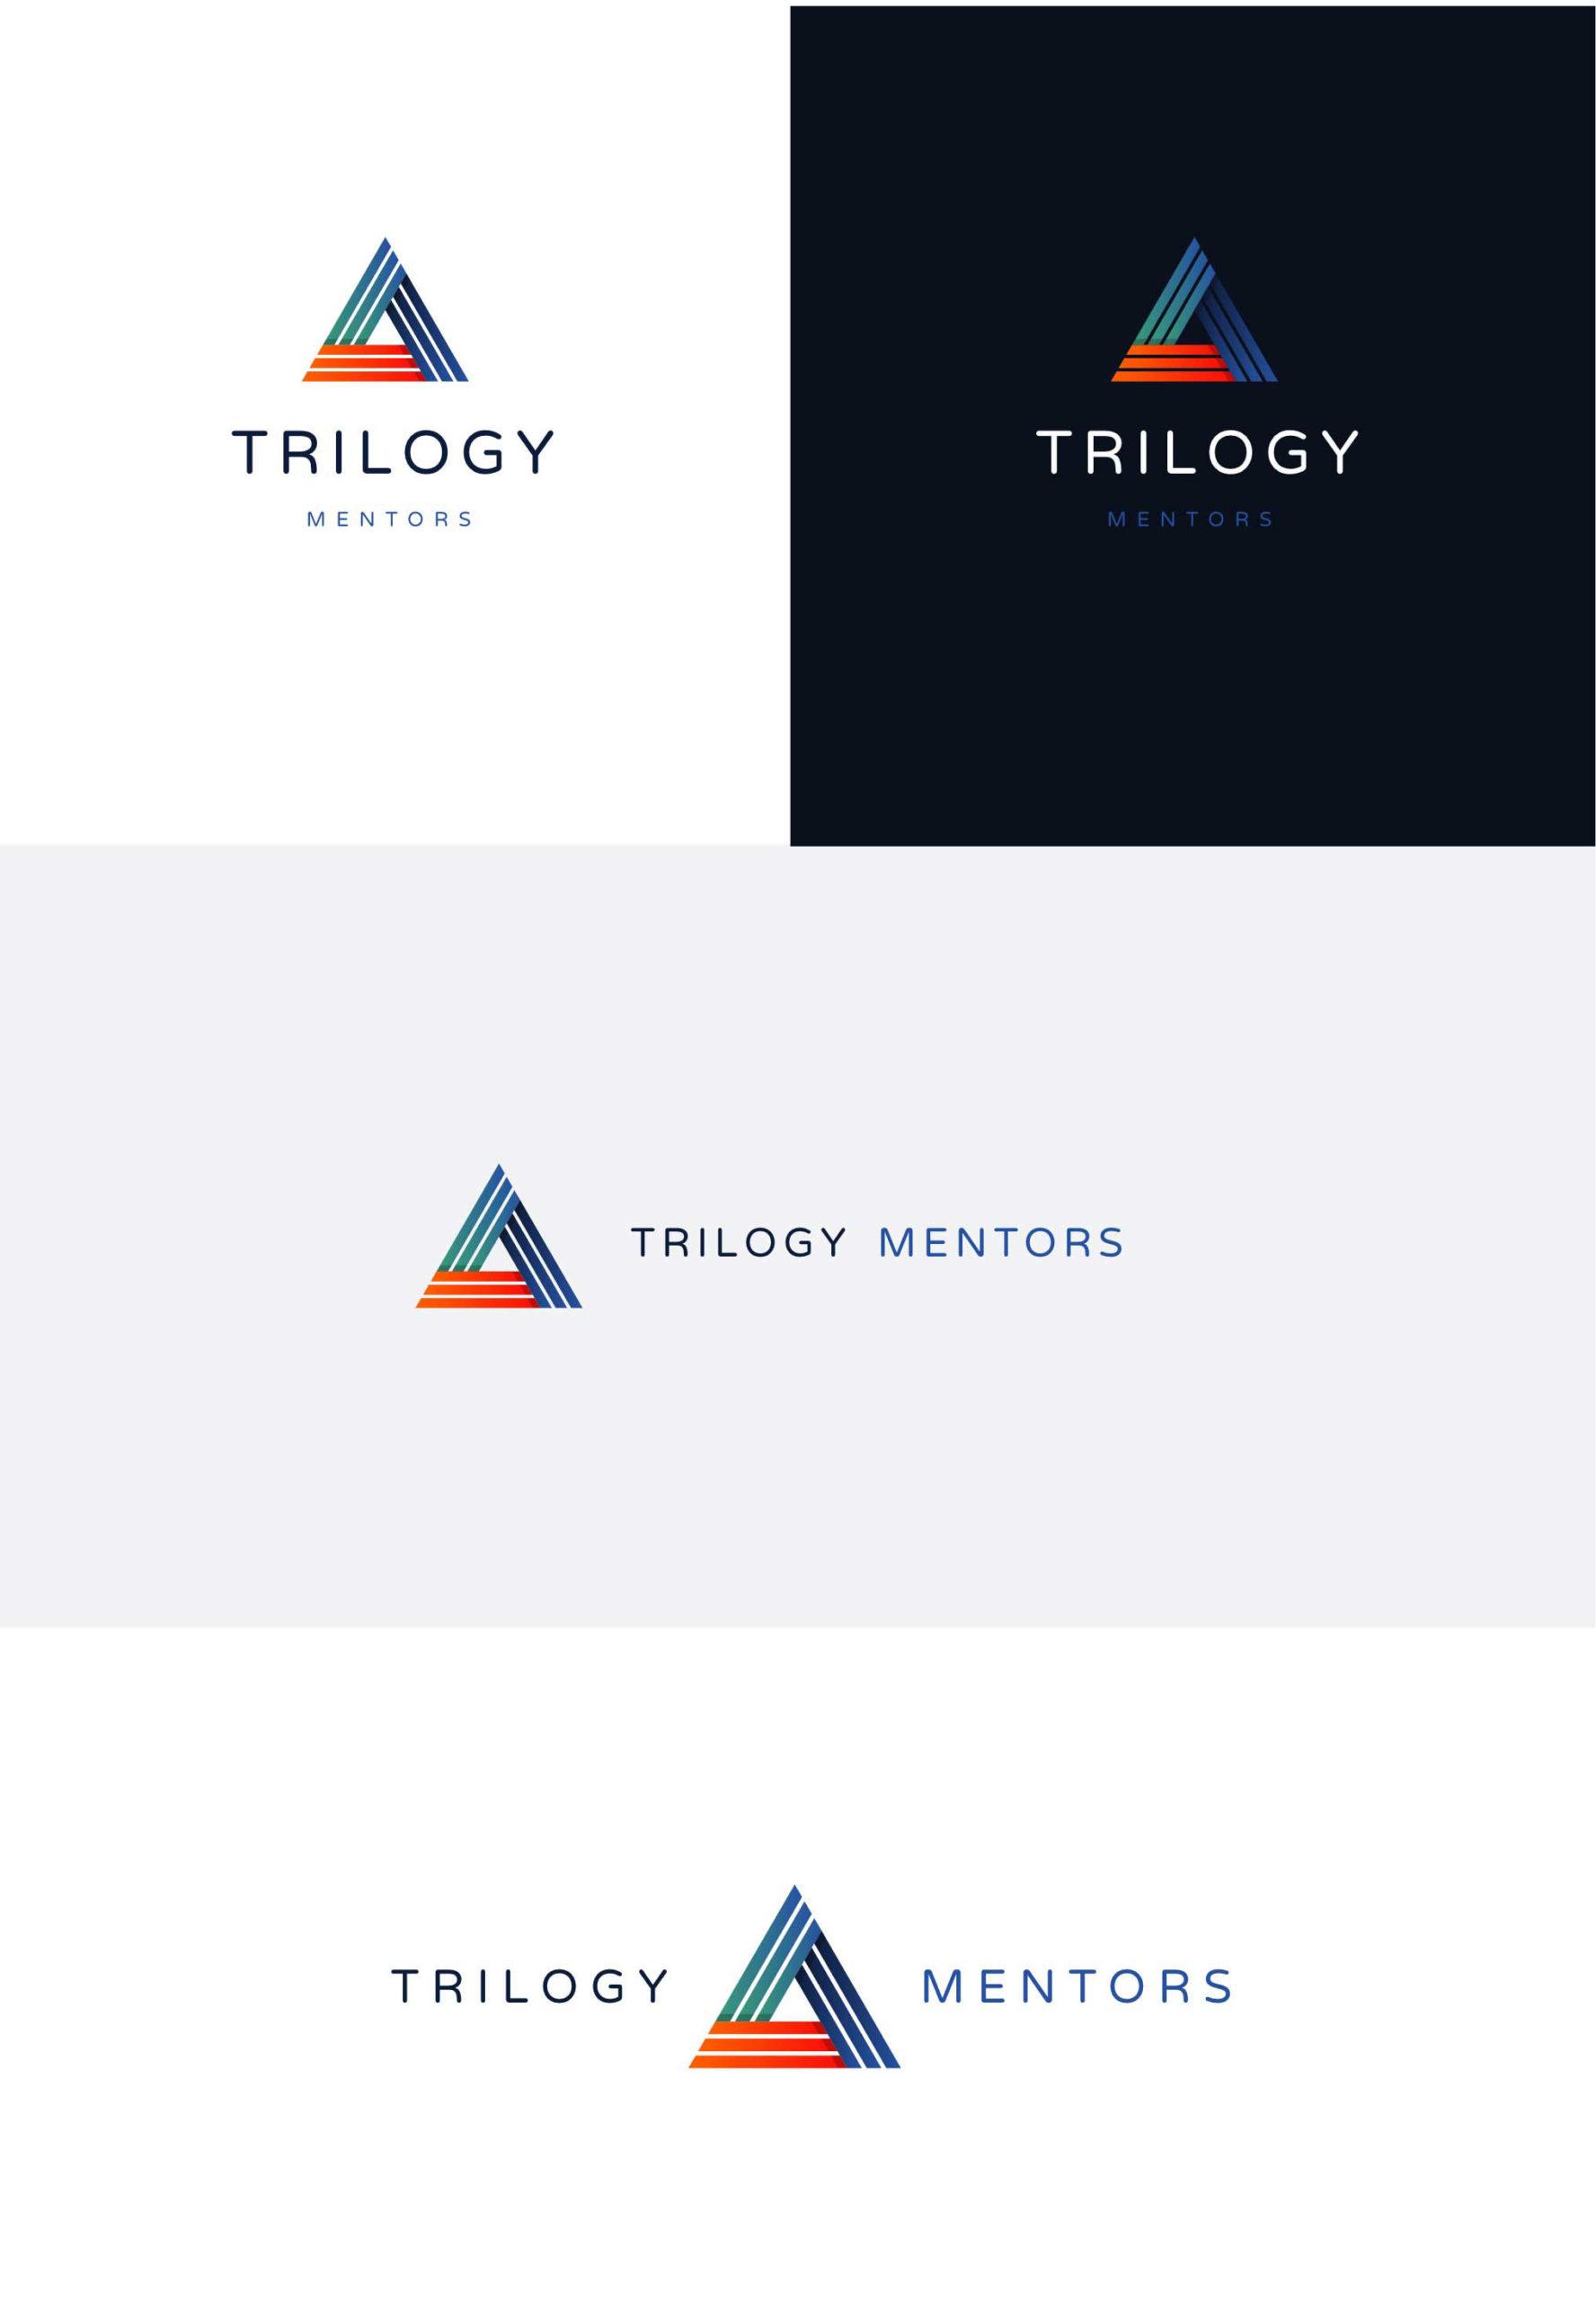 Trilogy Mentors logo concepts